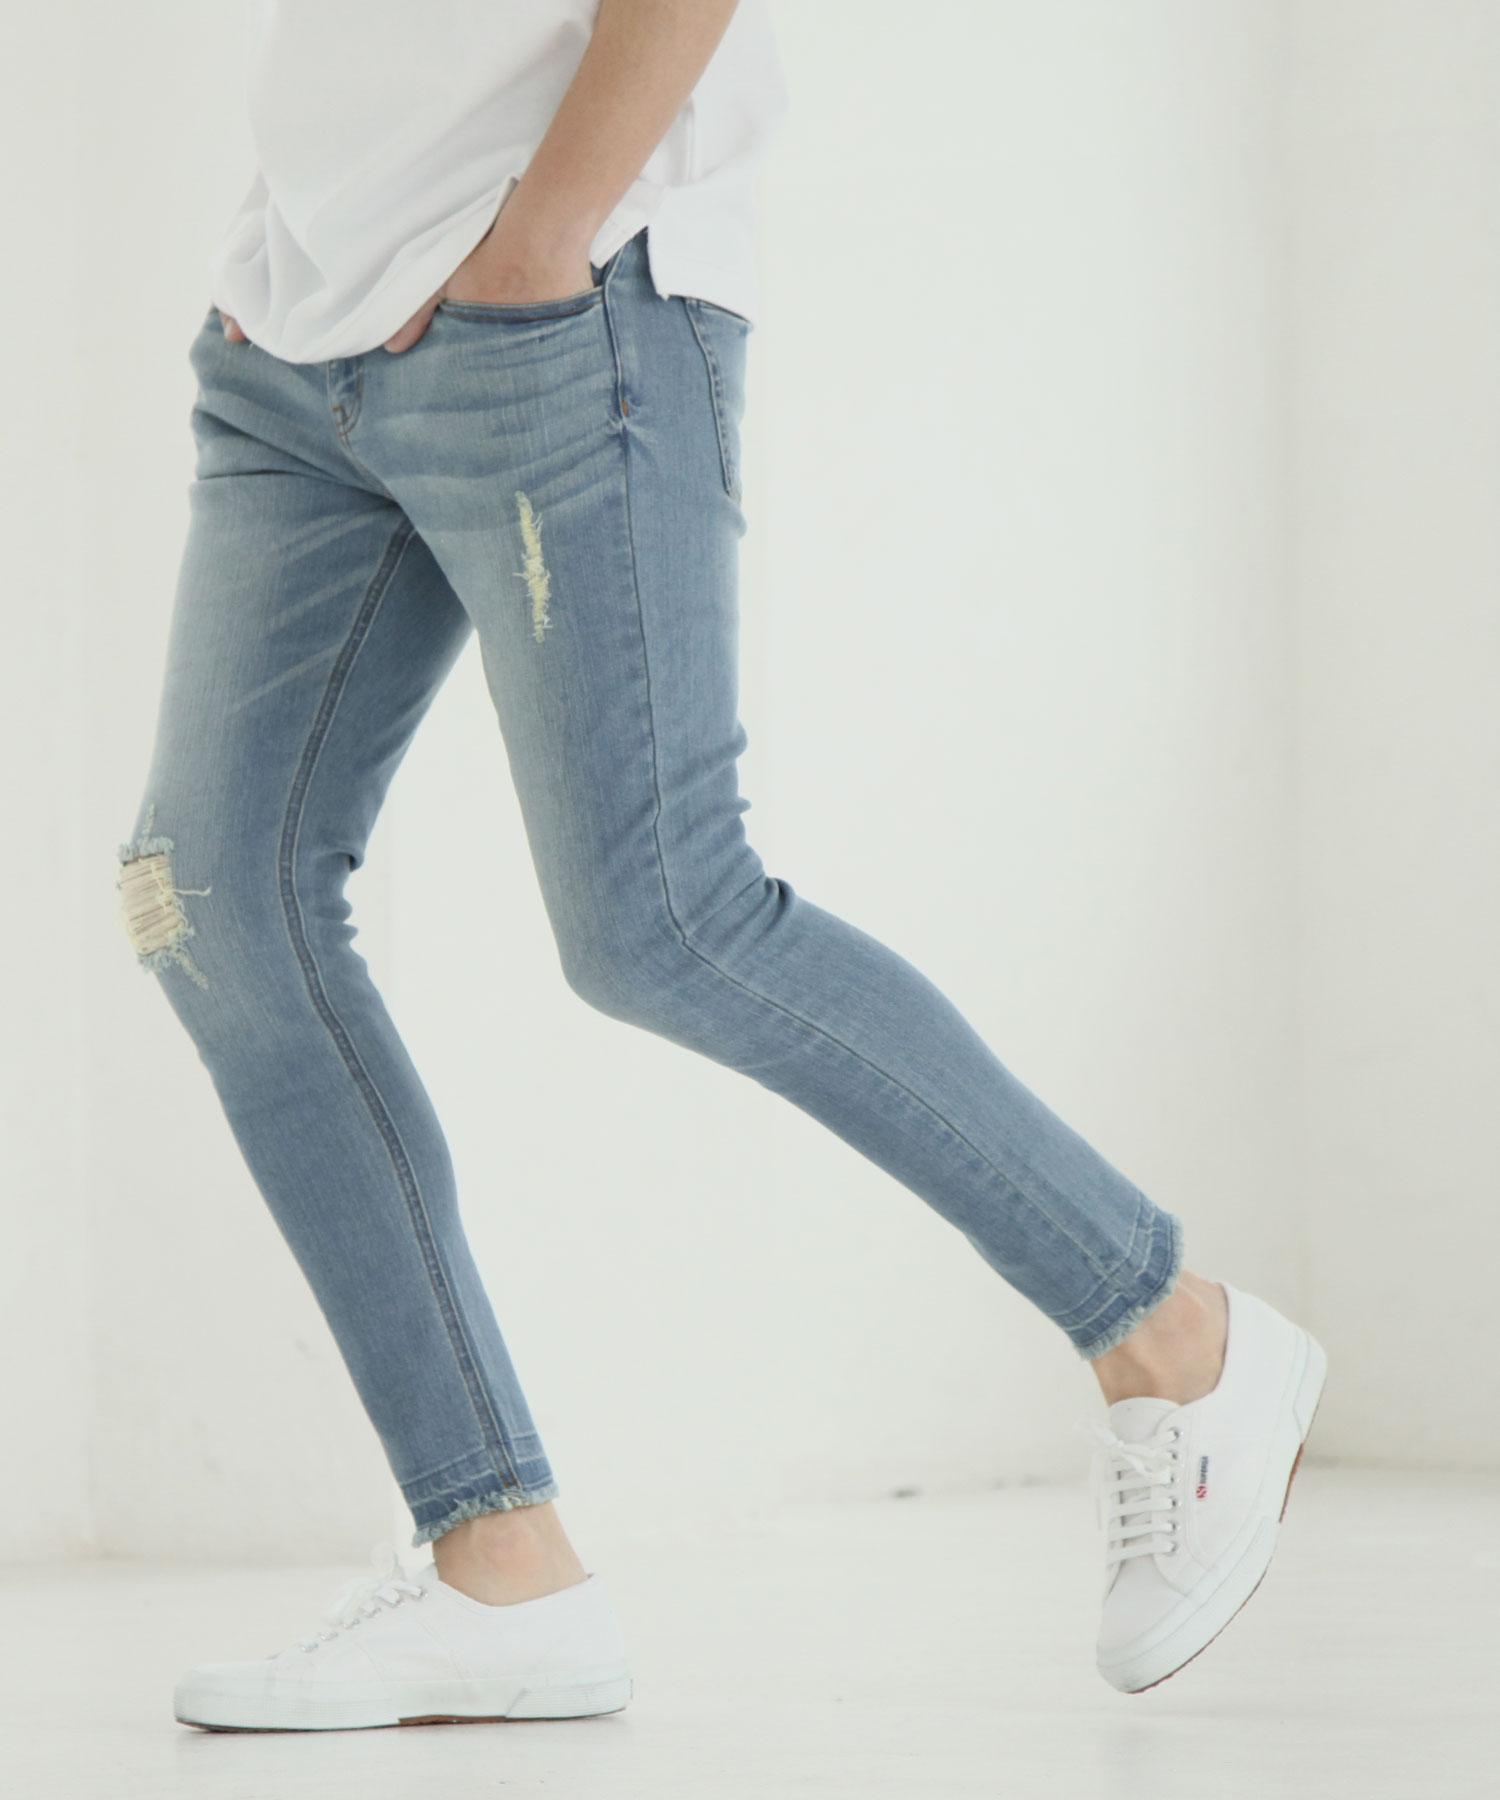 【Nilway】彈力窄管牛仔褲 破壞加工 6